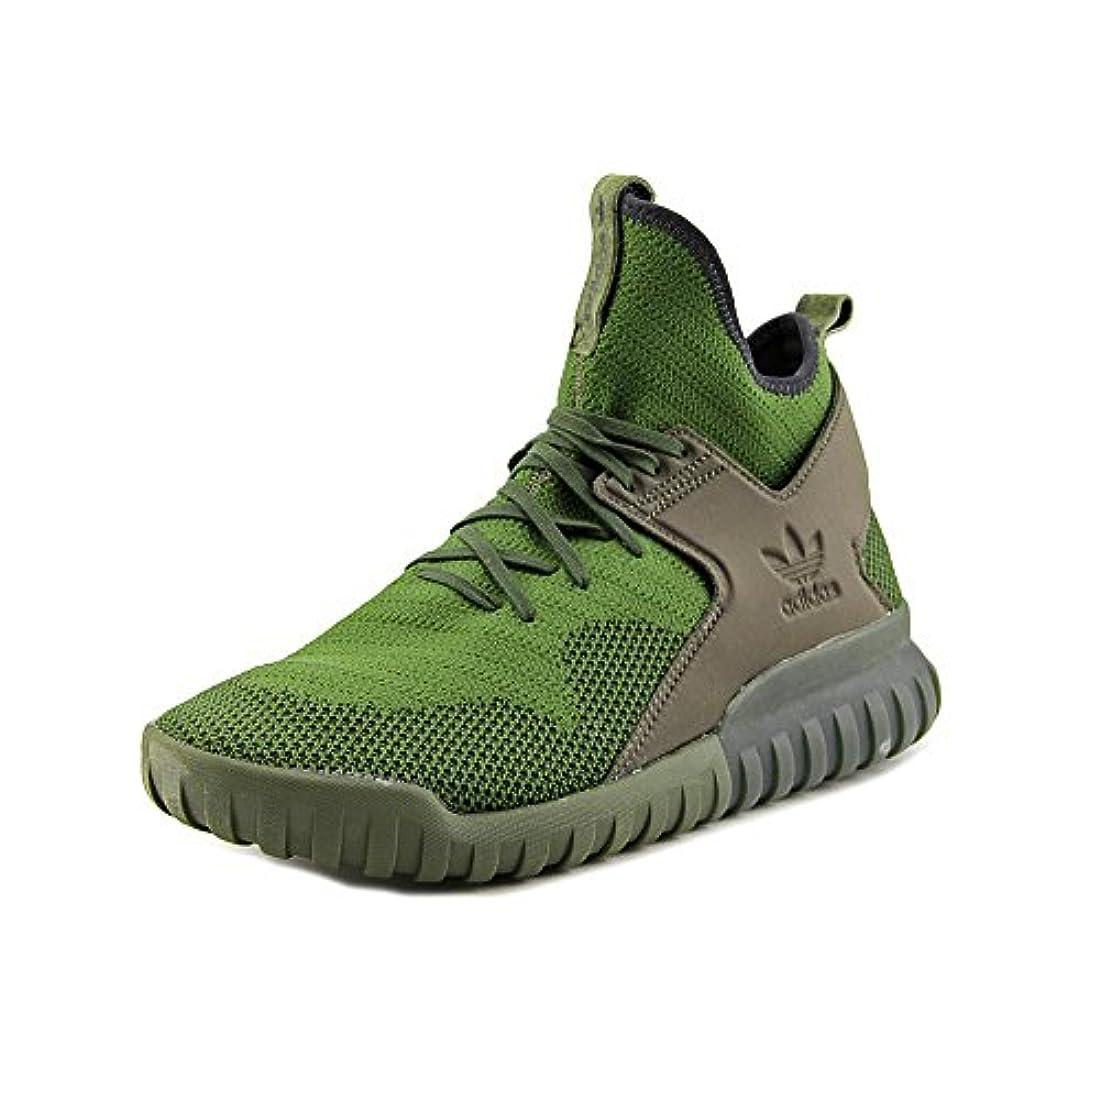 Adidas Org Tubulare X Primeknit Uomo S76713 Nightcargogreen Scarpe